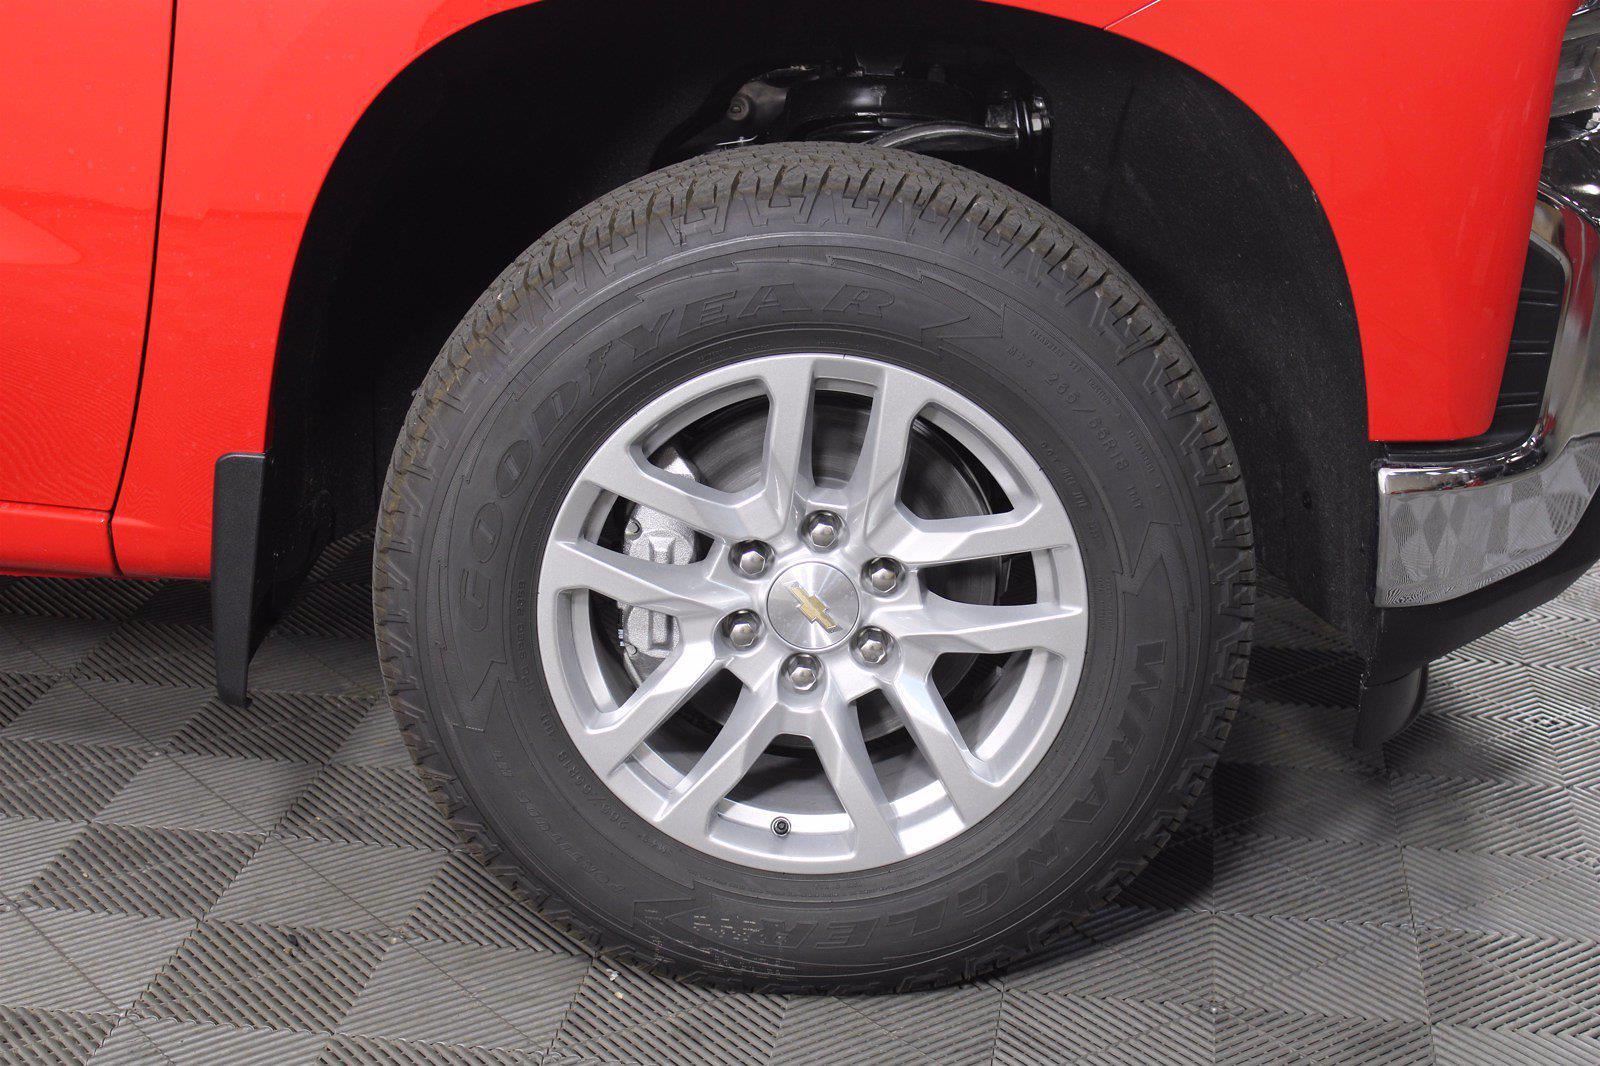 2021 Chevrolet Silverado 1500 Crew Cab 4x4, Pickup #D110819 - photo 6